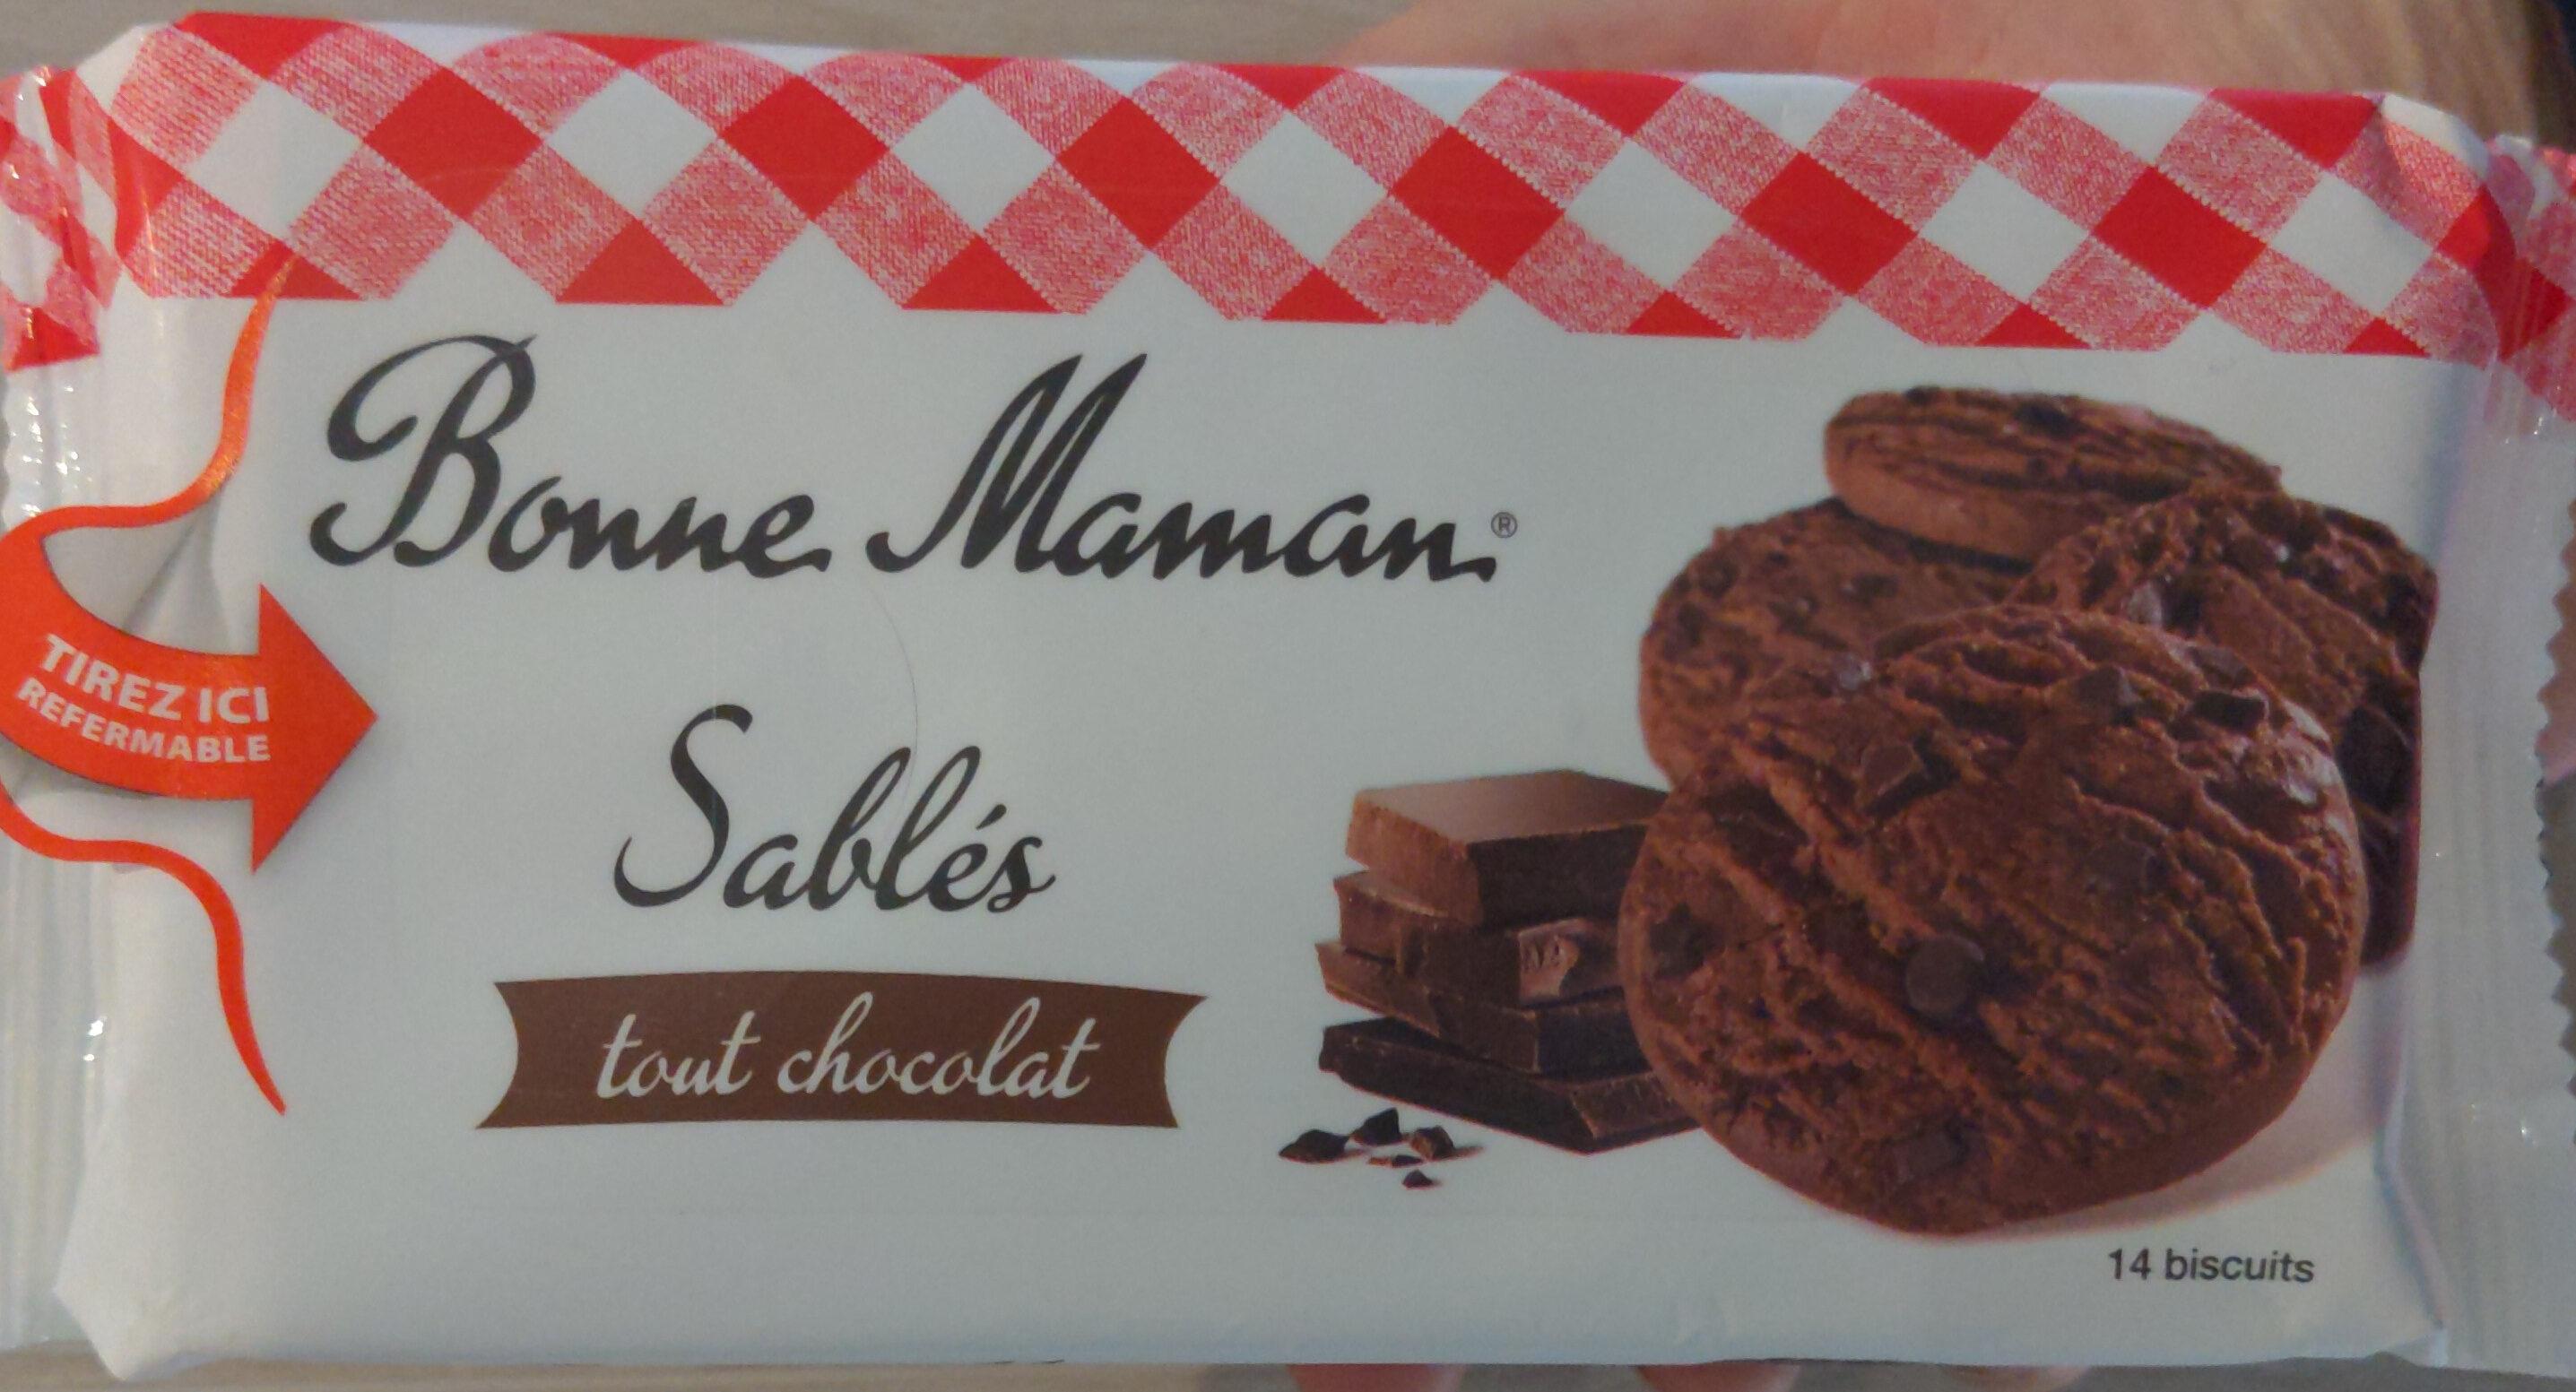 Sablés tout chocolat - Prodotto - fr